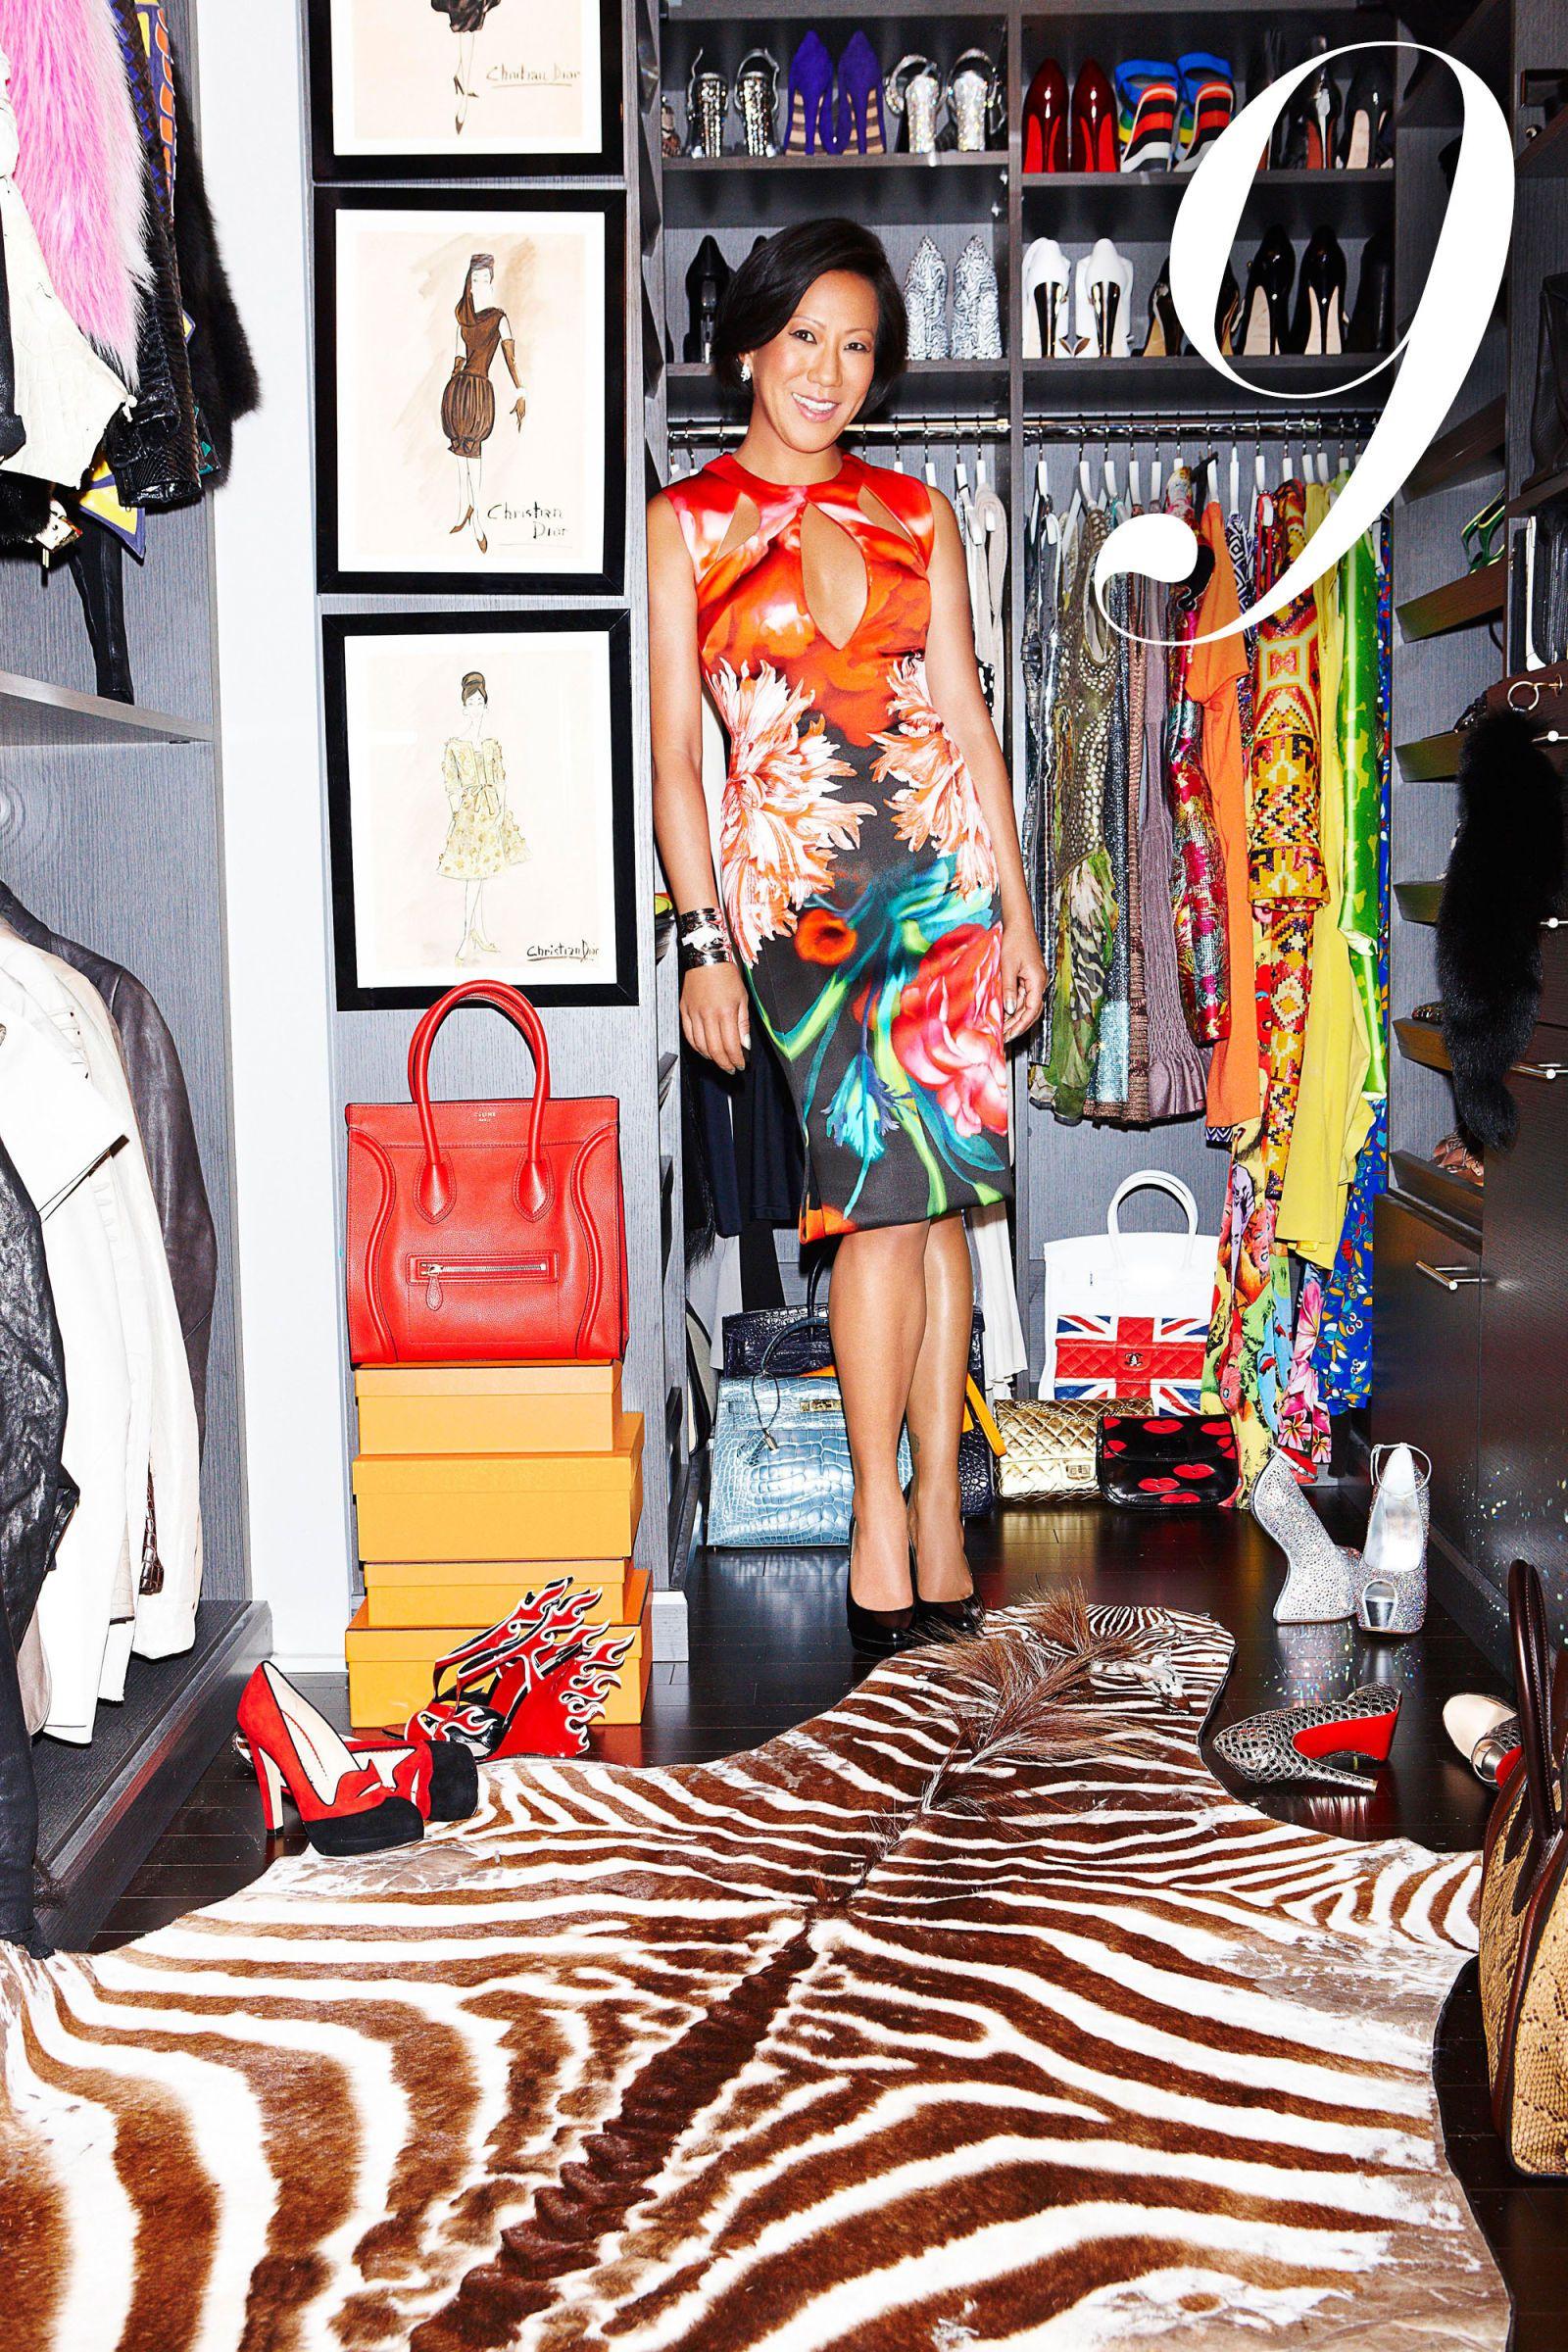 Best Dressing Room Design: Pin On Closets